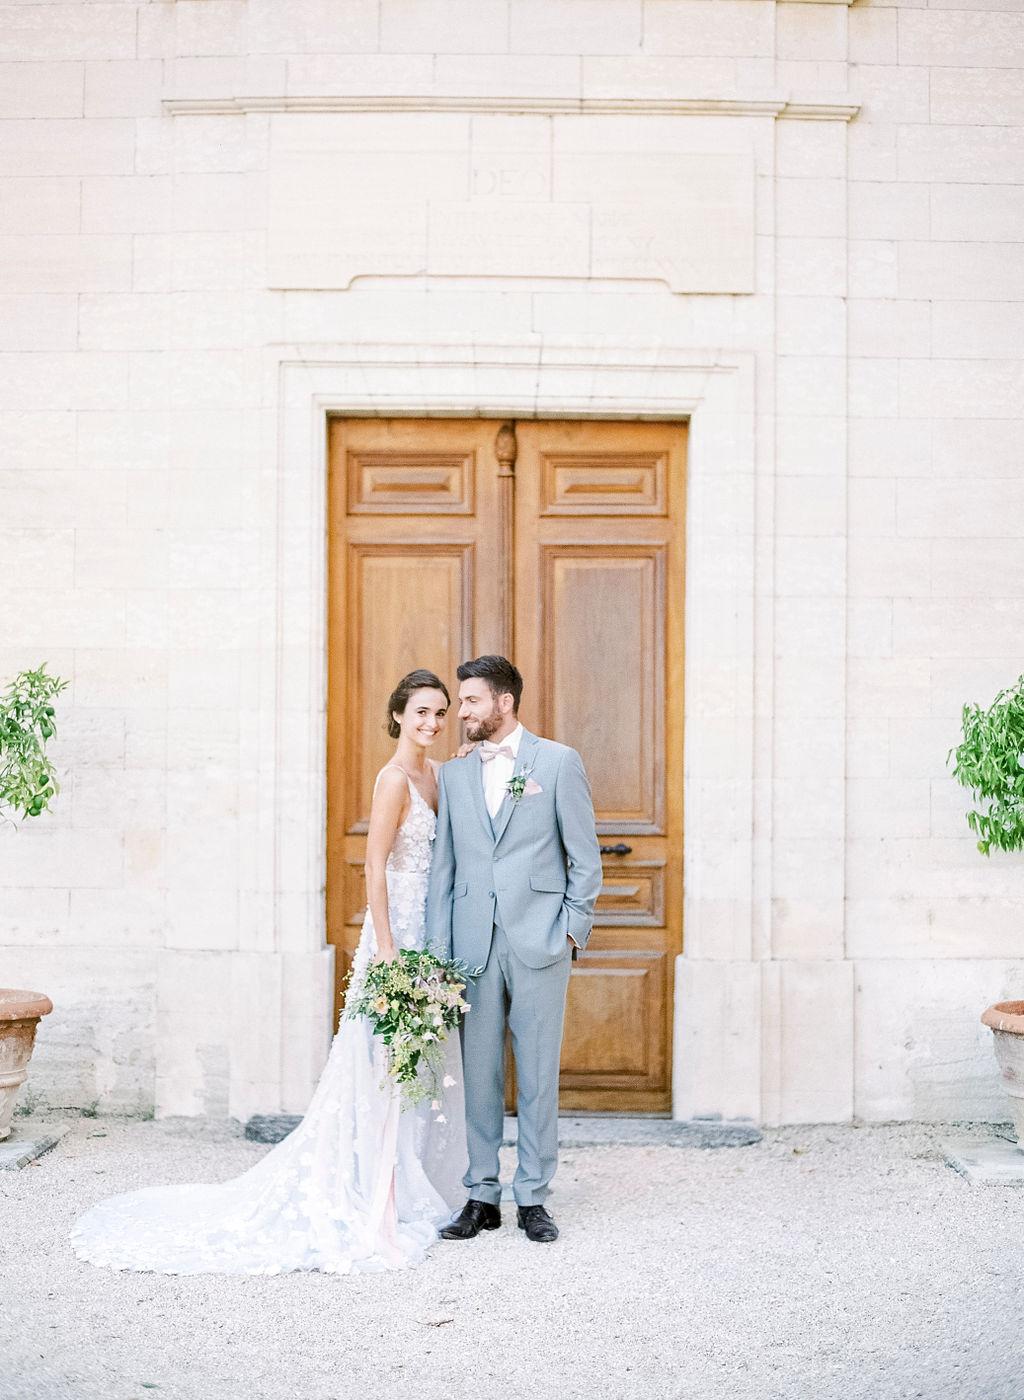 bride and groom, wedding couple, wedding in provence, chateau de tourreau, chateau wedding, destination wedding france